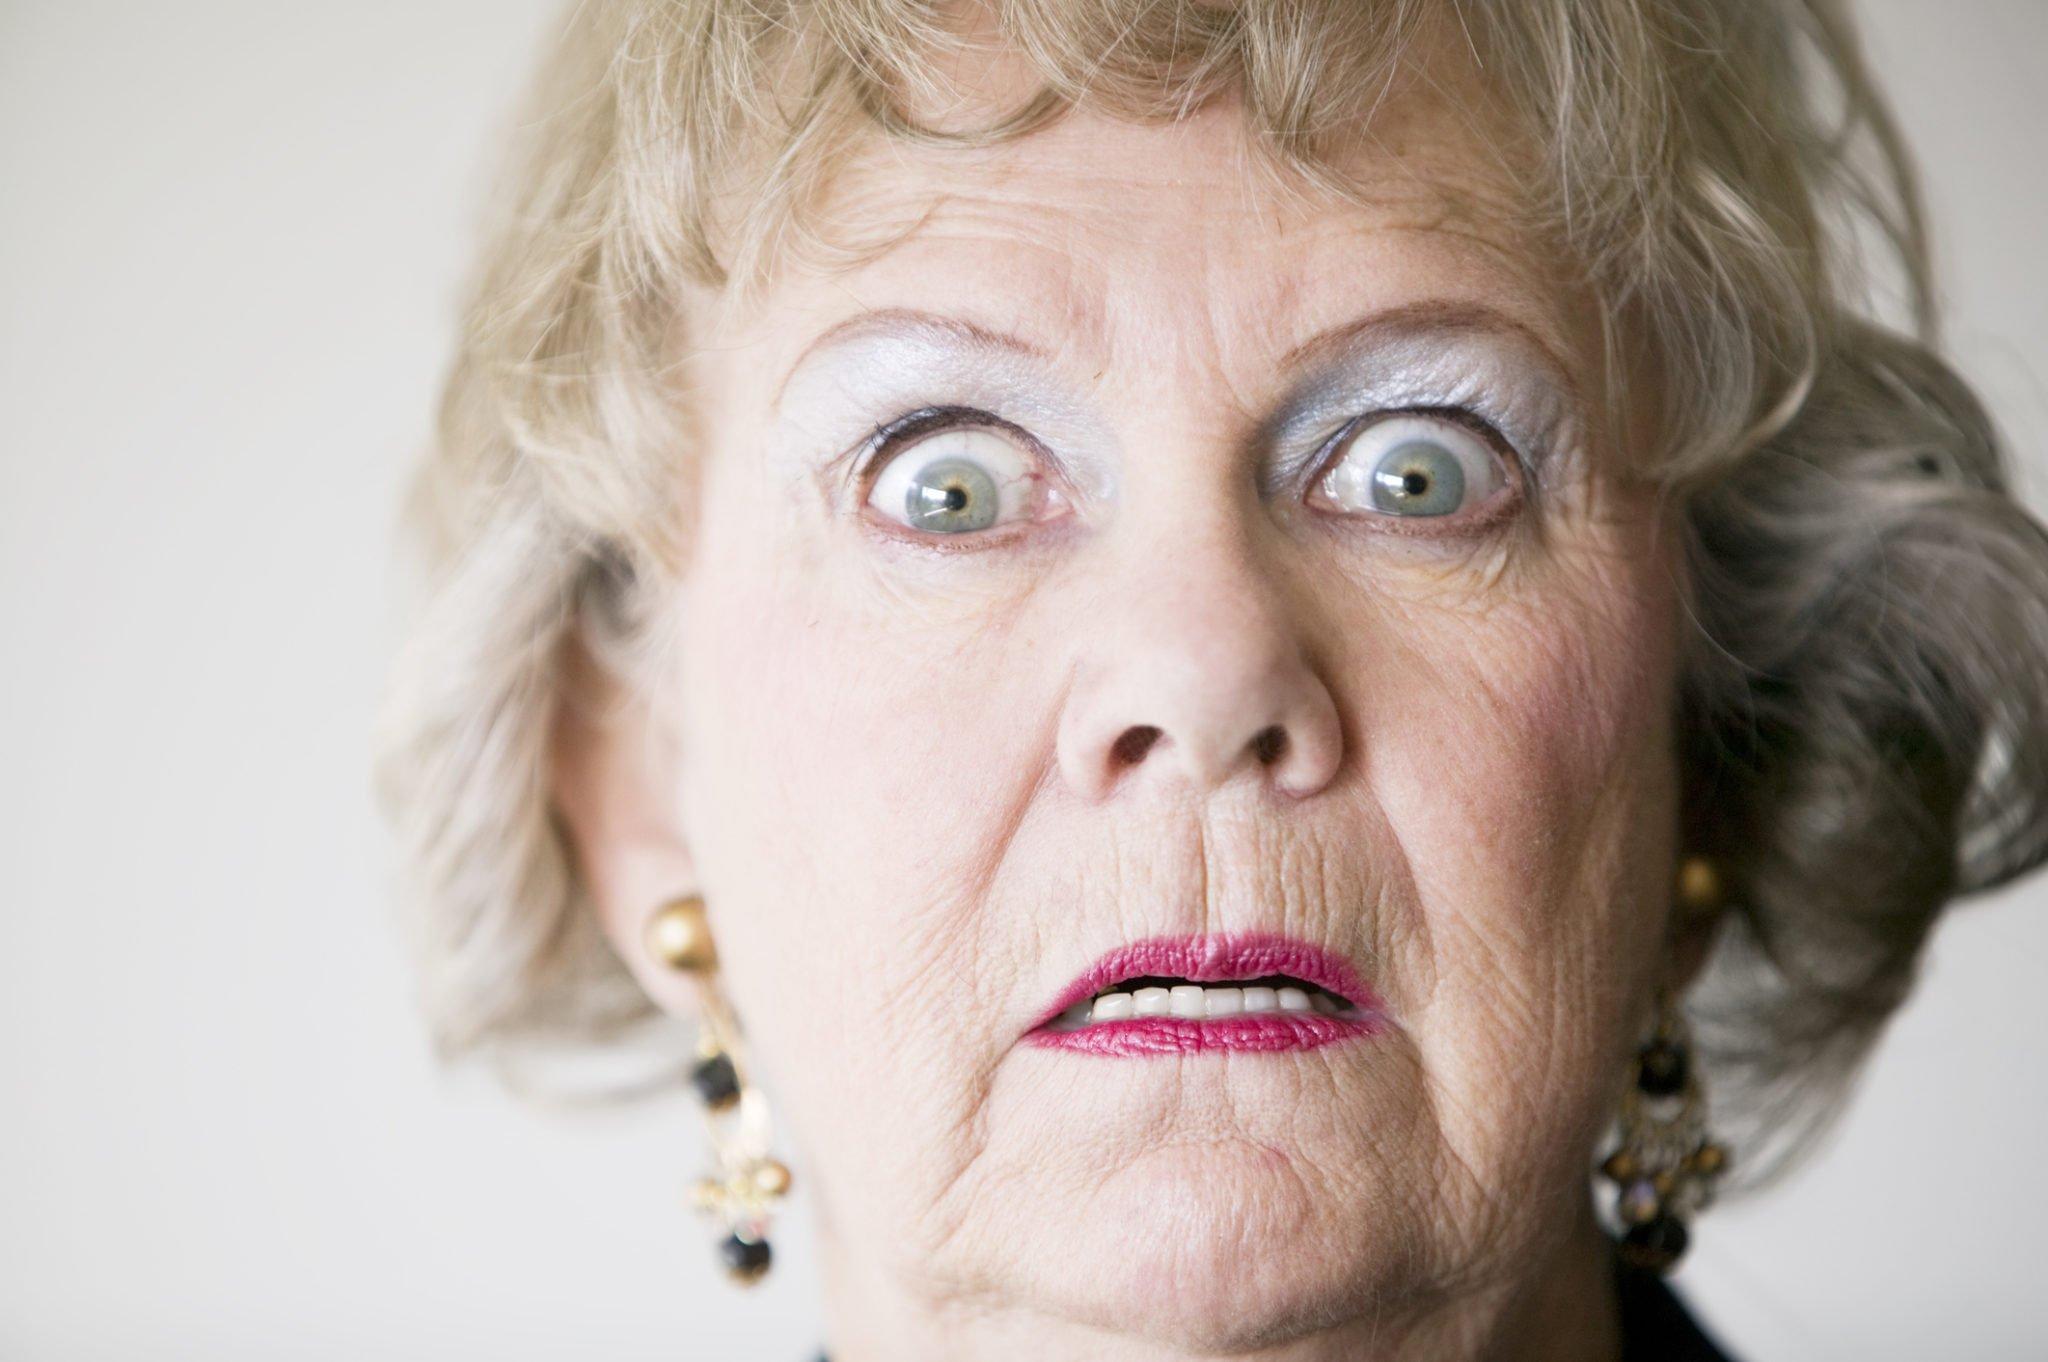 horrified woman